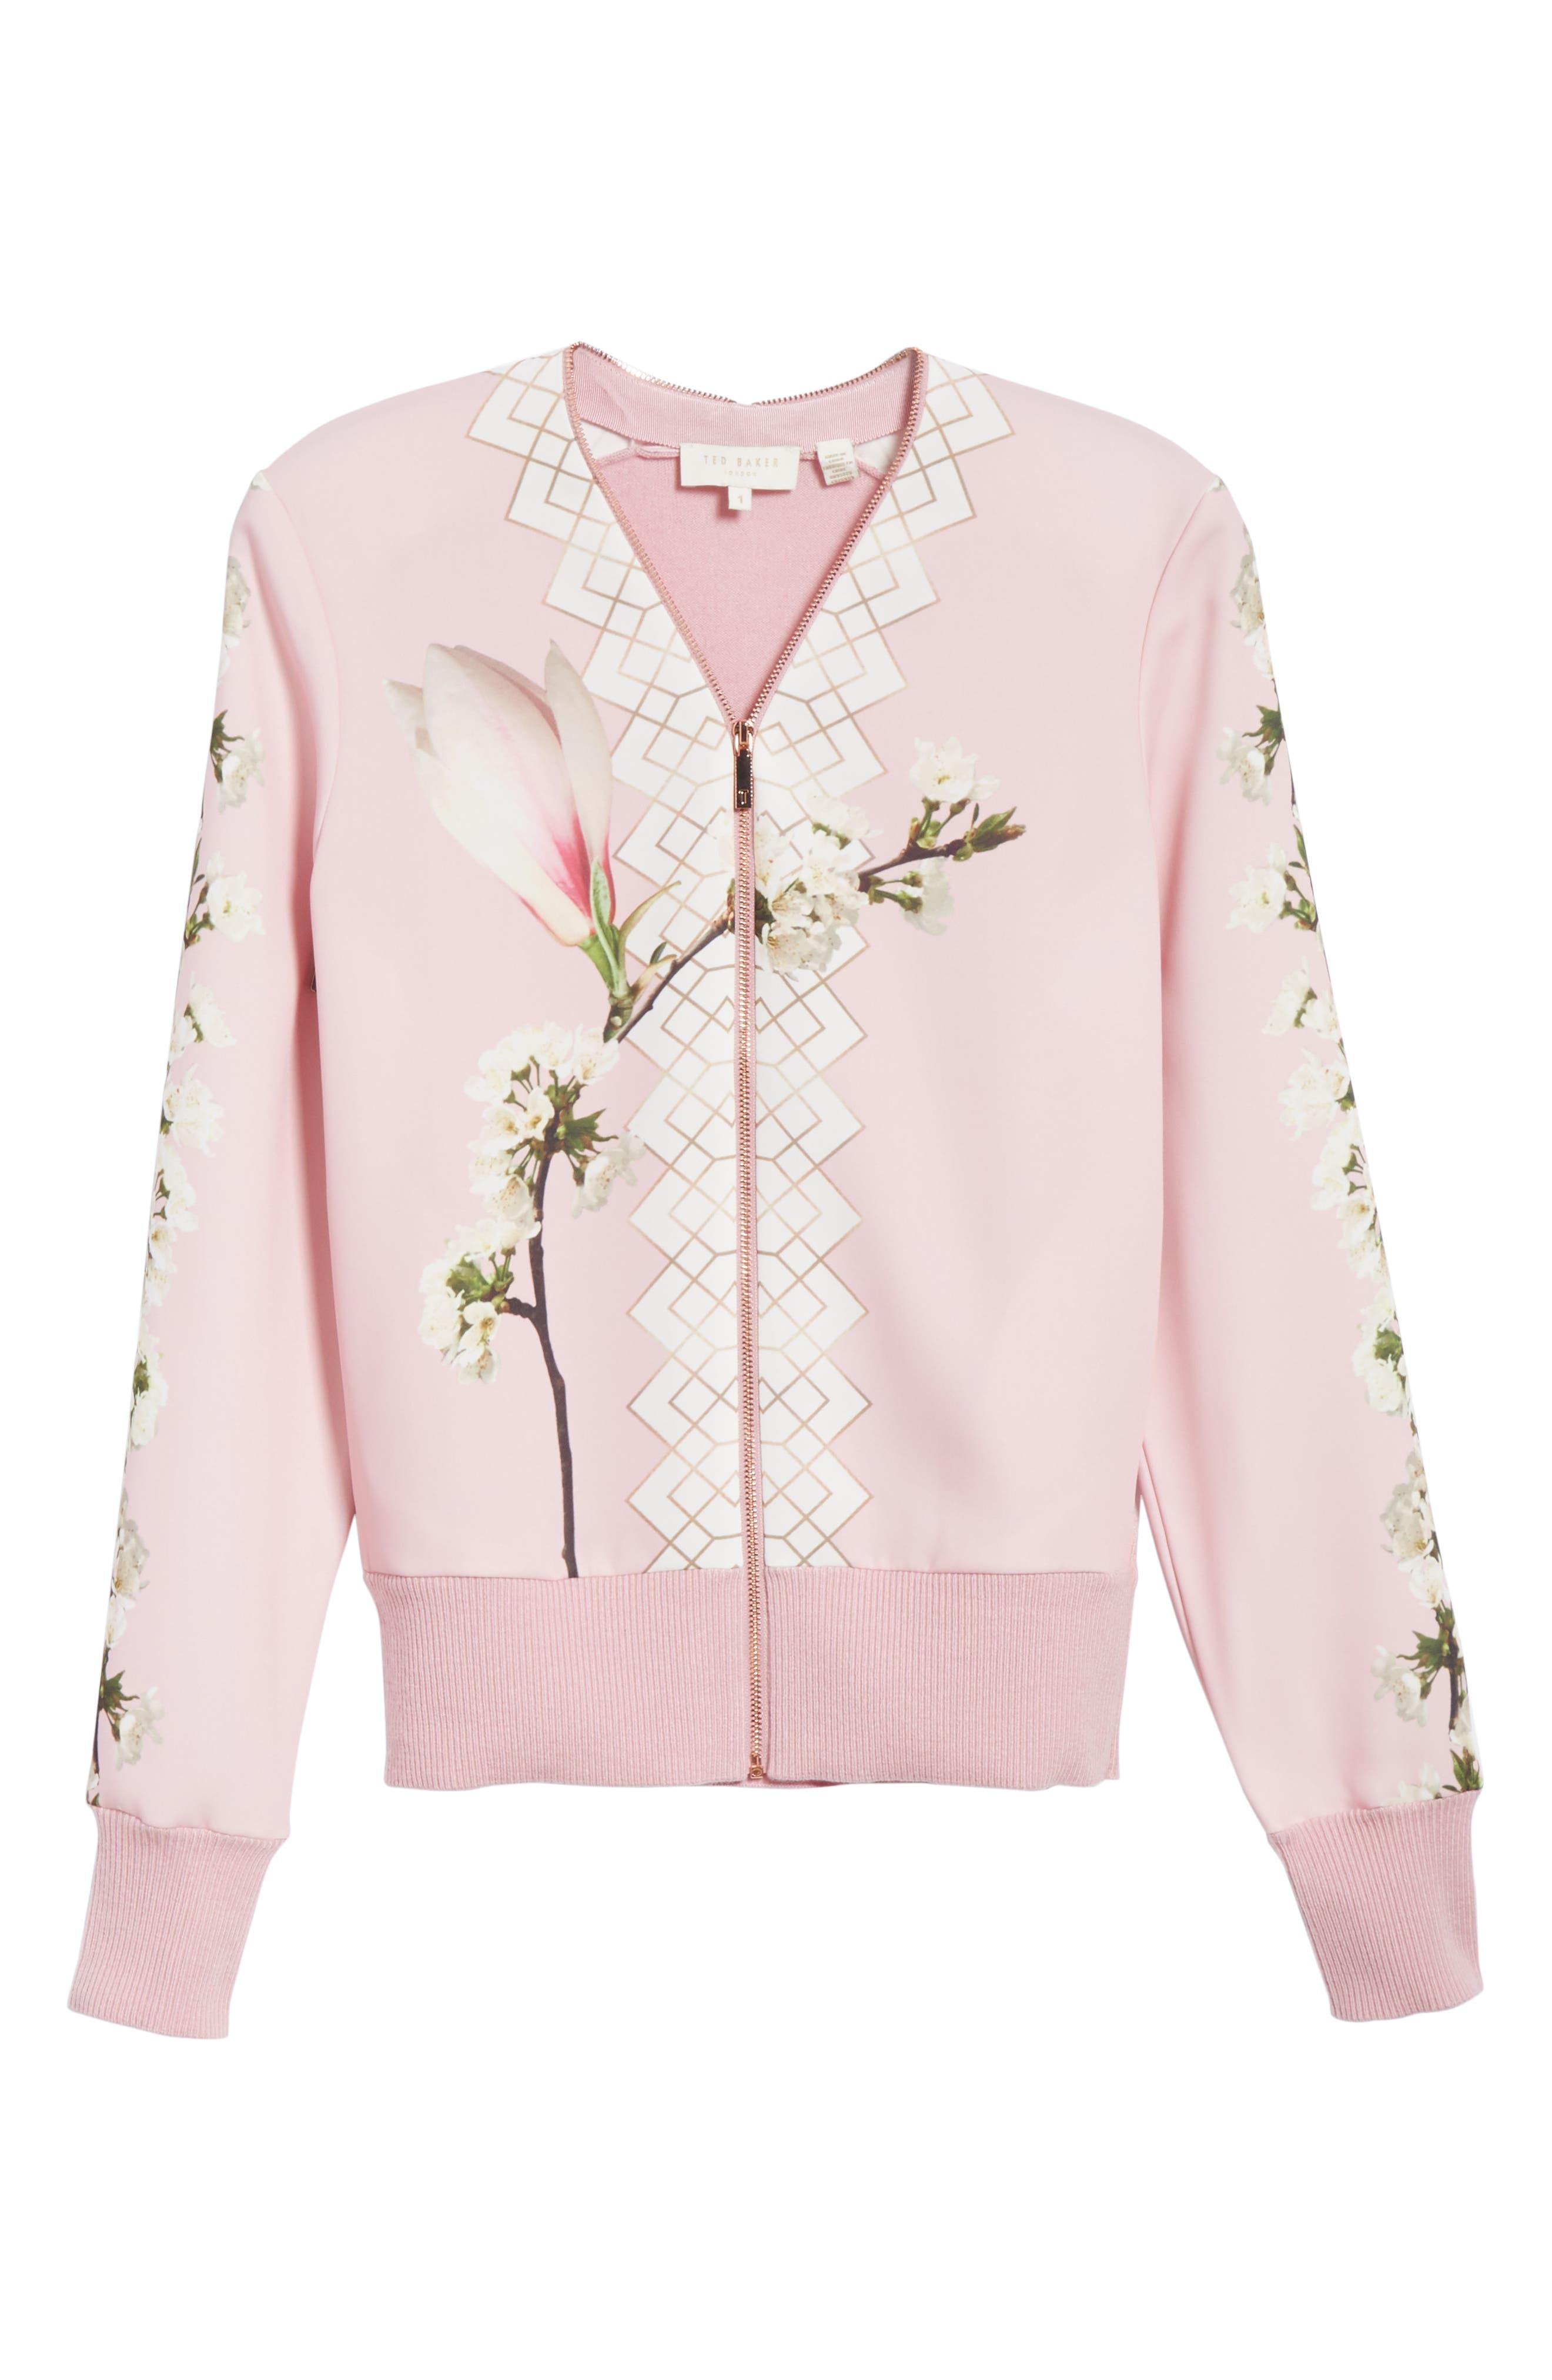 Emylou Harmony Bomber Jacket,                             Alternate thumbnail 6, color,                             Pale Pink